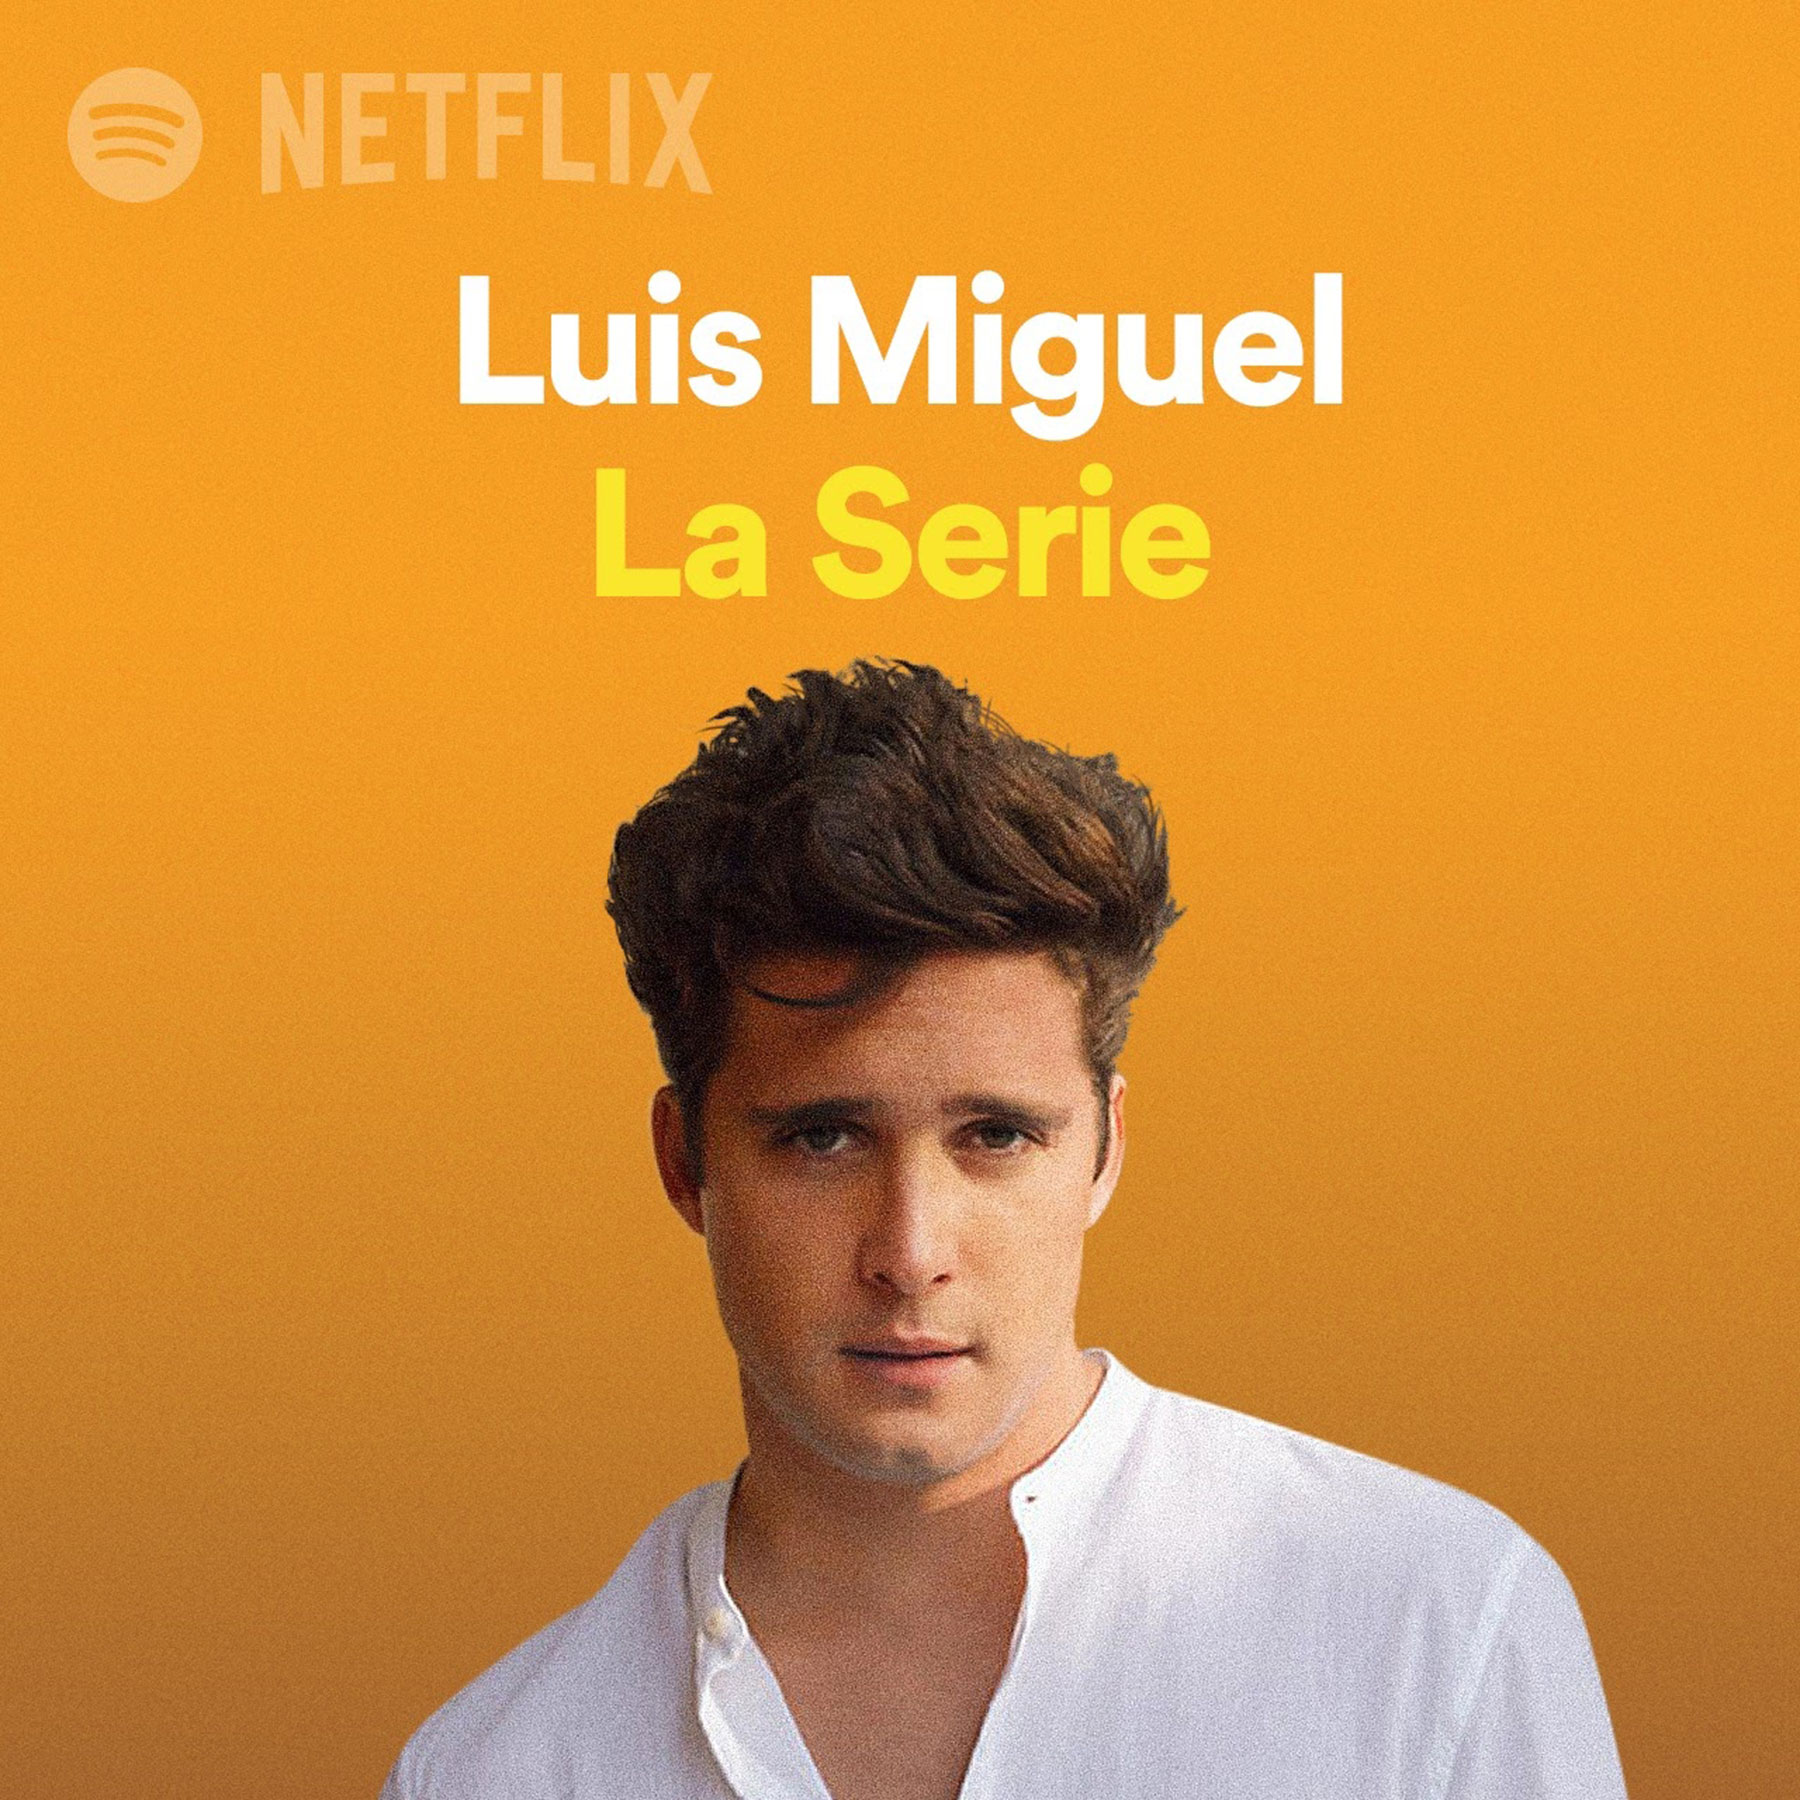 diego boneta spotify soundtrack luis miguel la serie